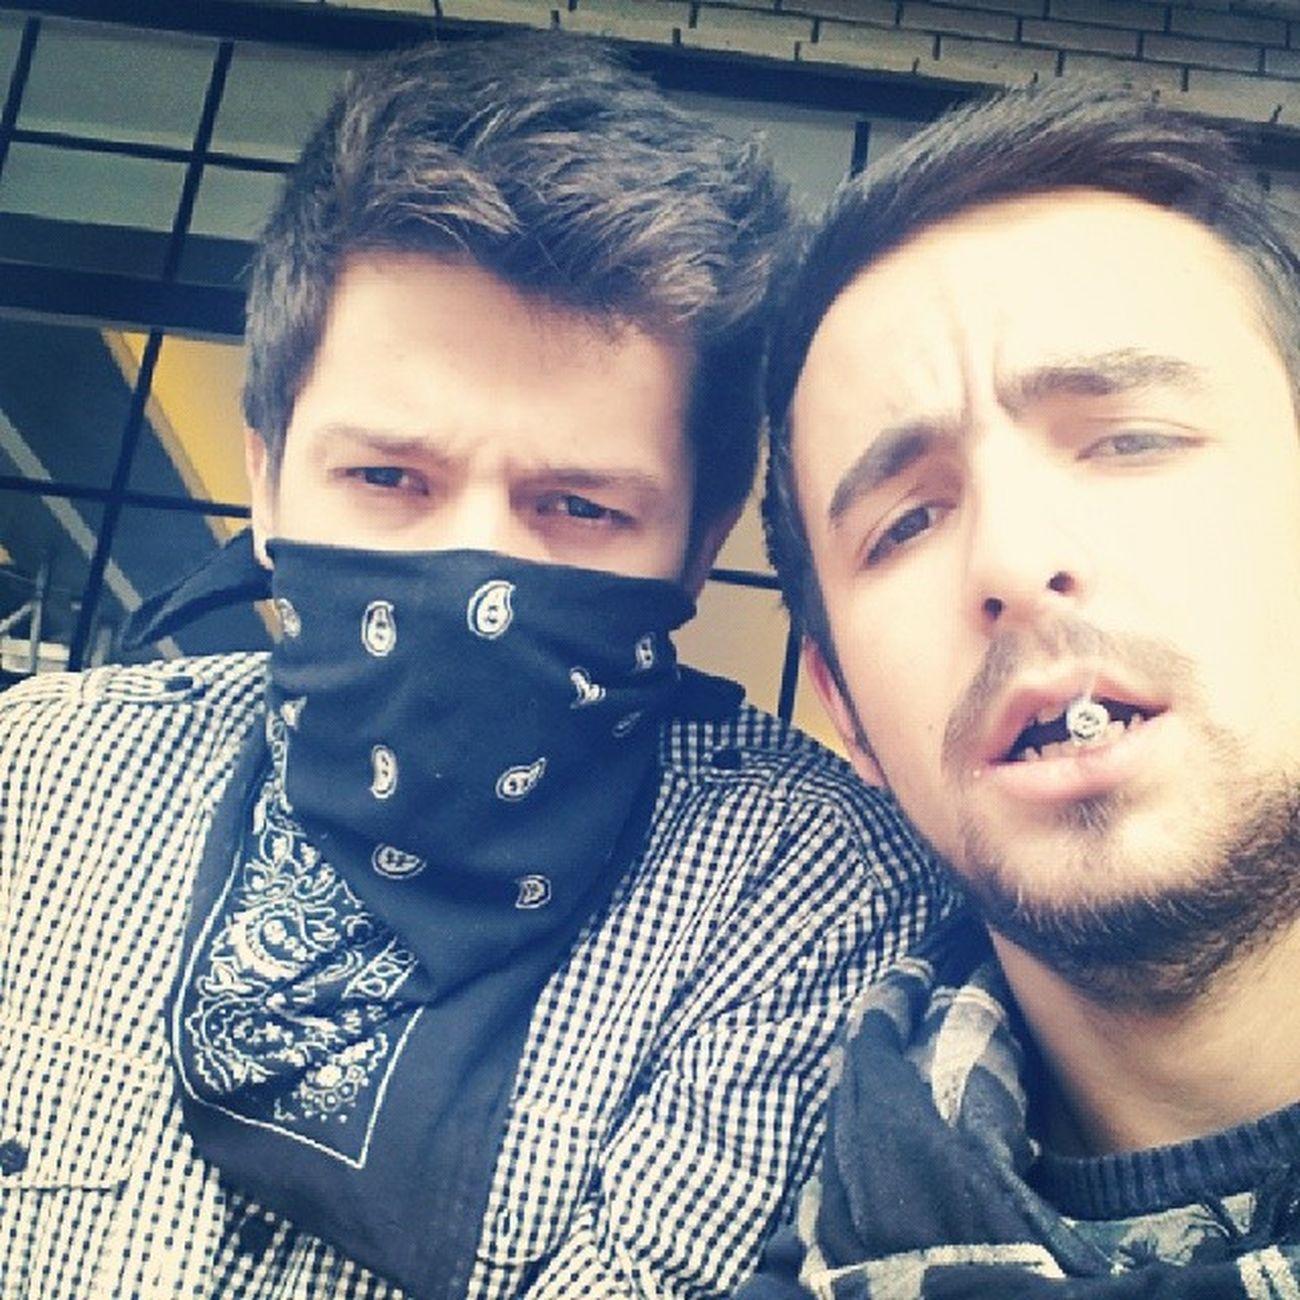 şamdan Hendek Sakarya Gangsta shit bandana cigarrettes sigara smoke @ilkeraltmis